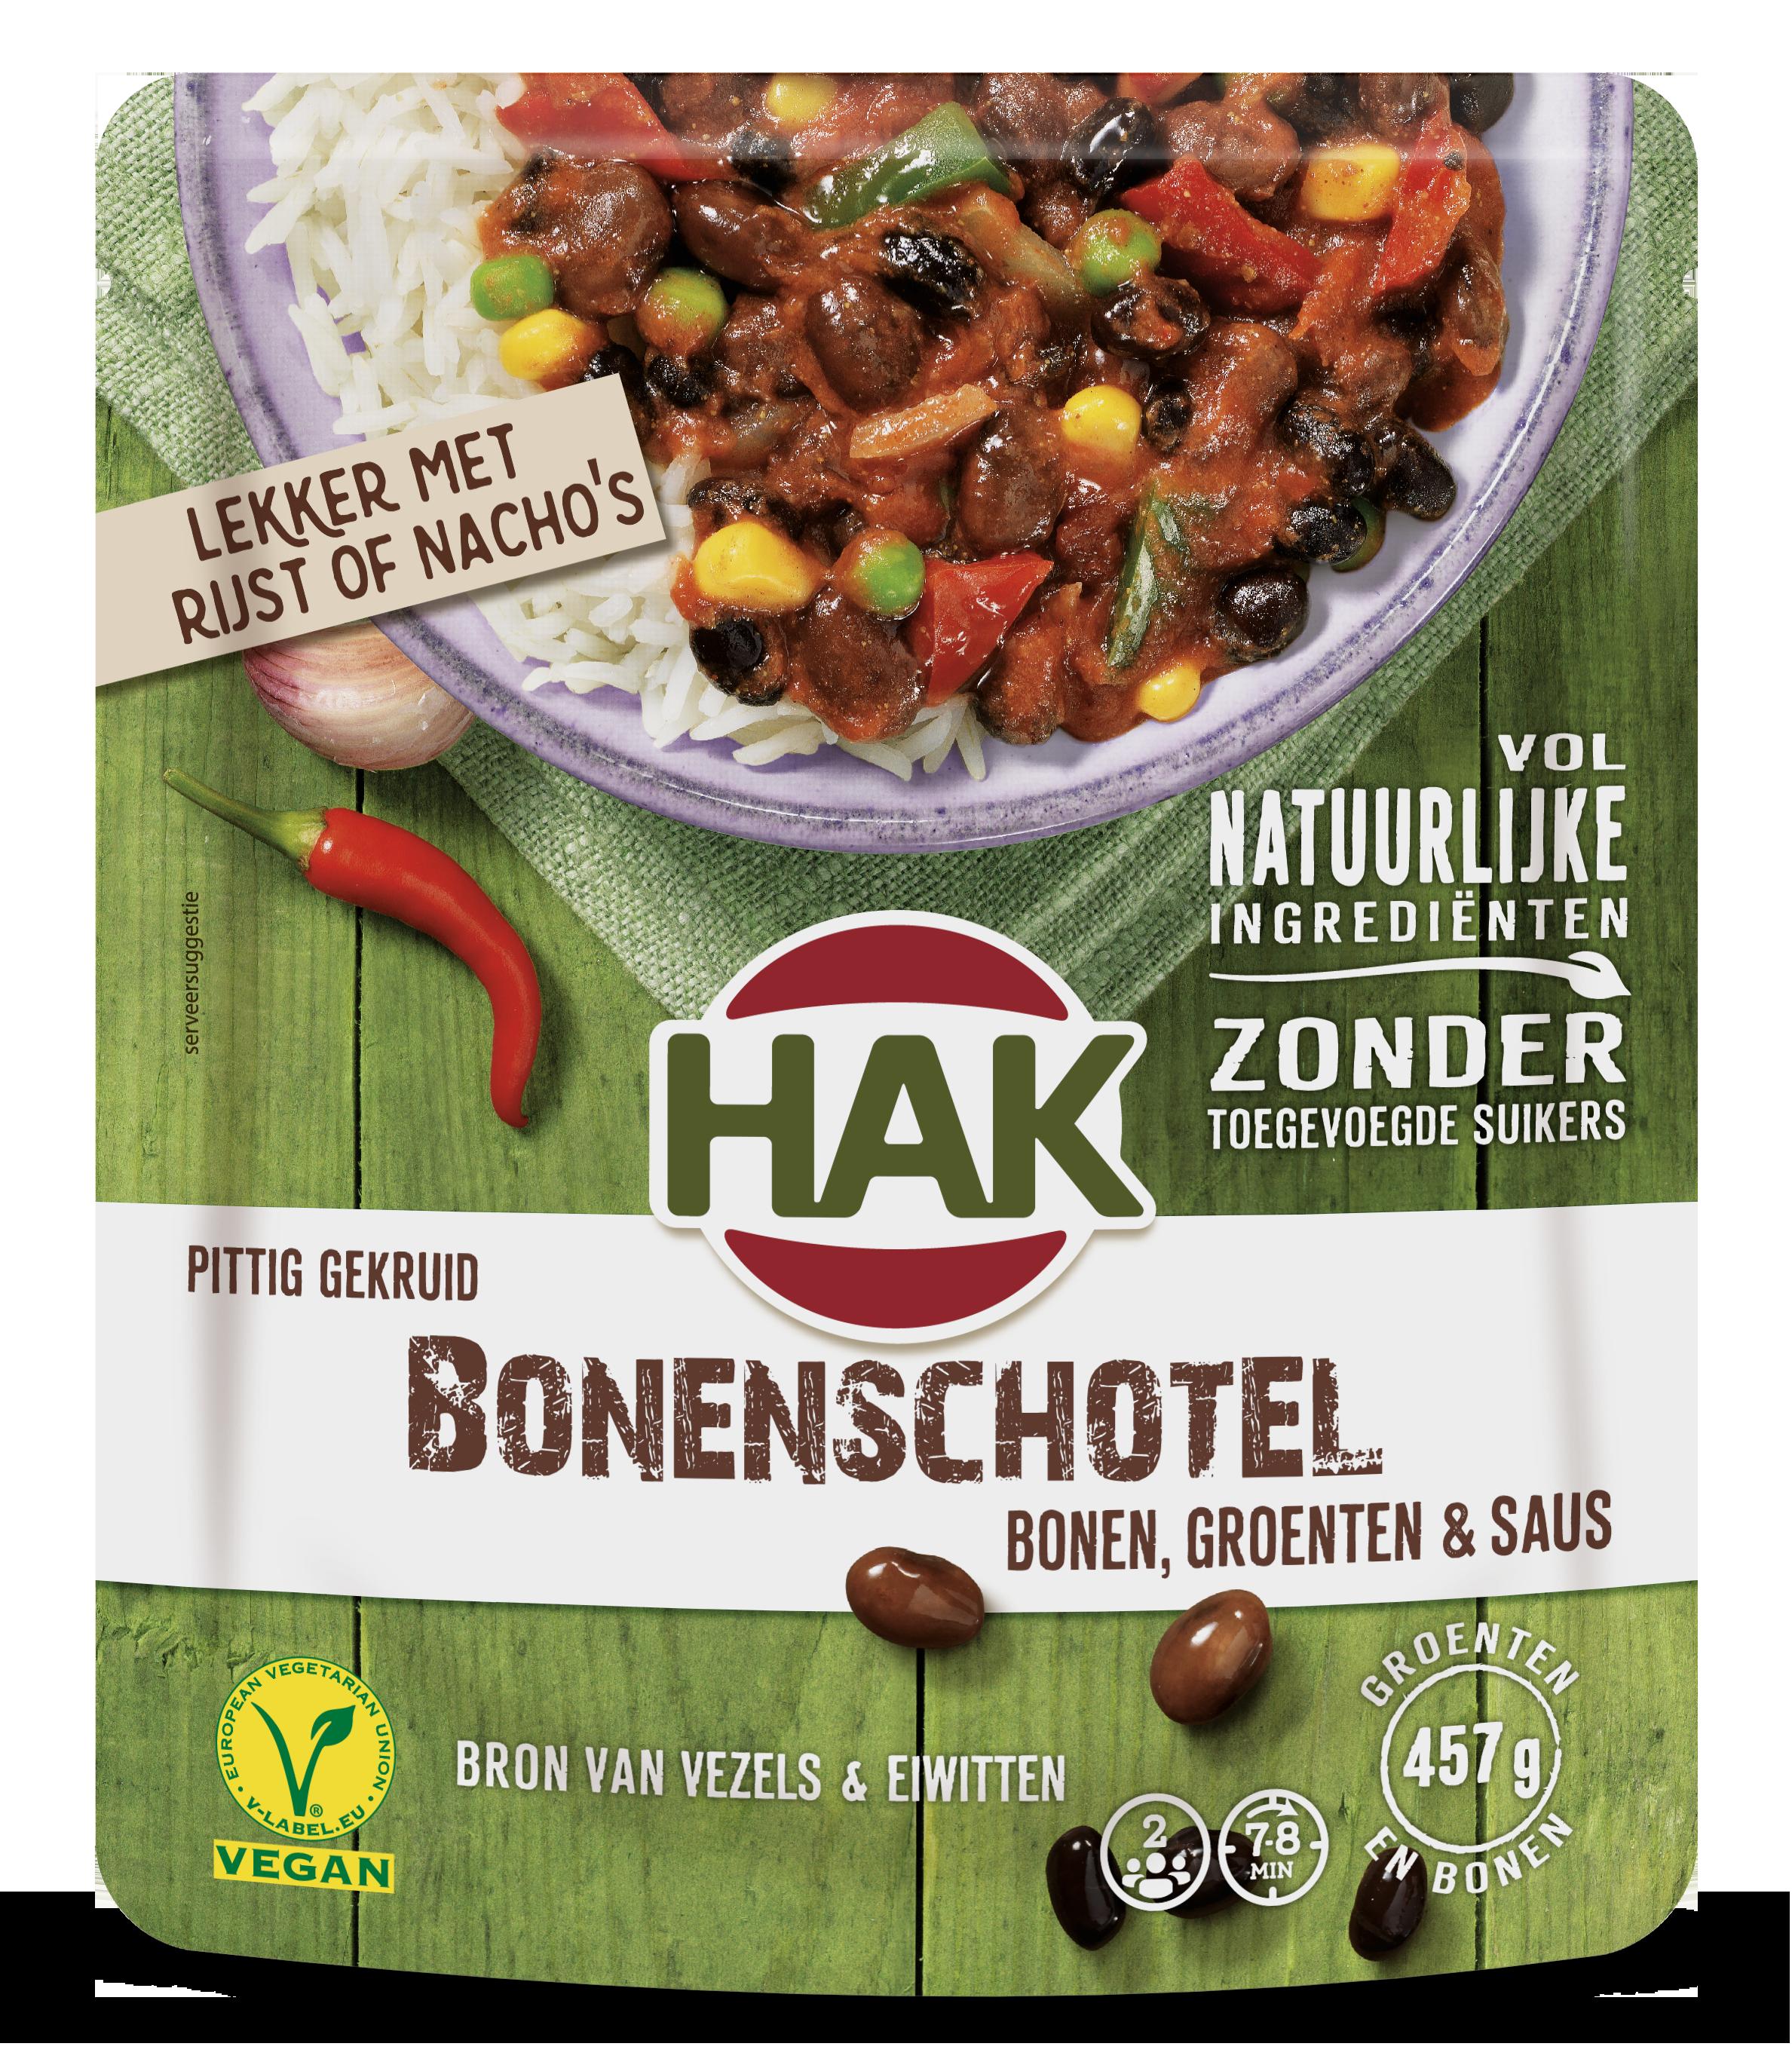 HAK Bonenschotel NL 550g 8720600616327